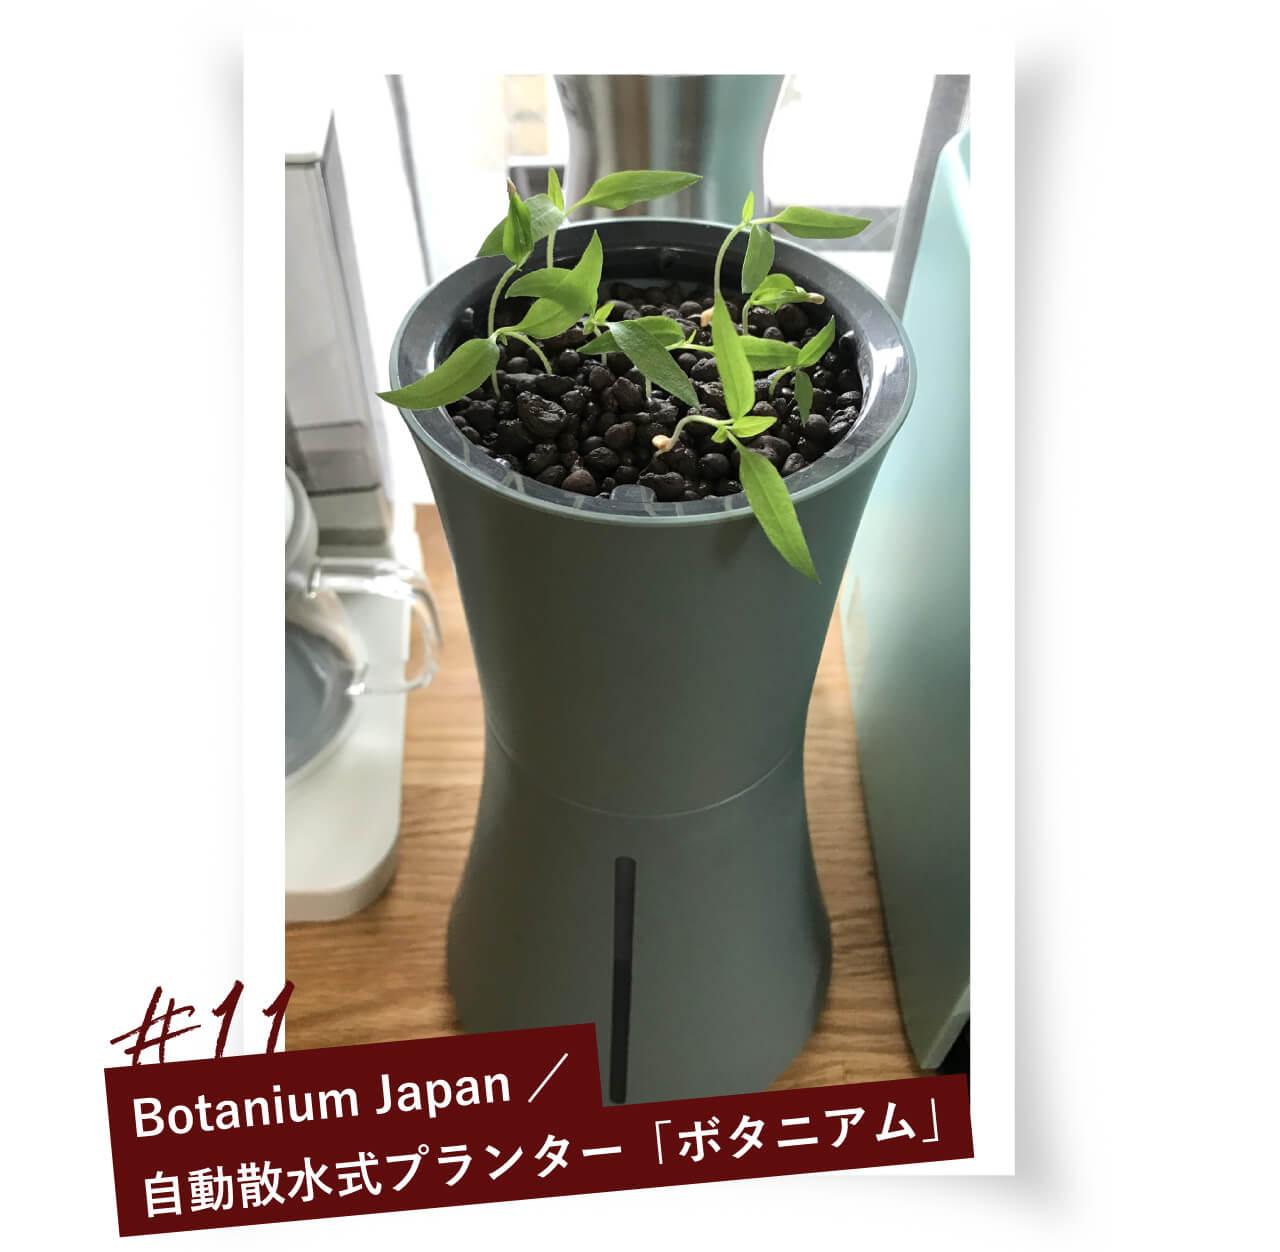 #11 Botanium Japan/水耕栽培キット・家庭菜園プランターのBotanium(ボタニアム)